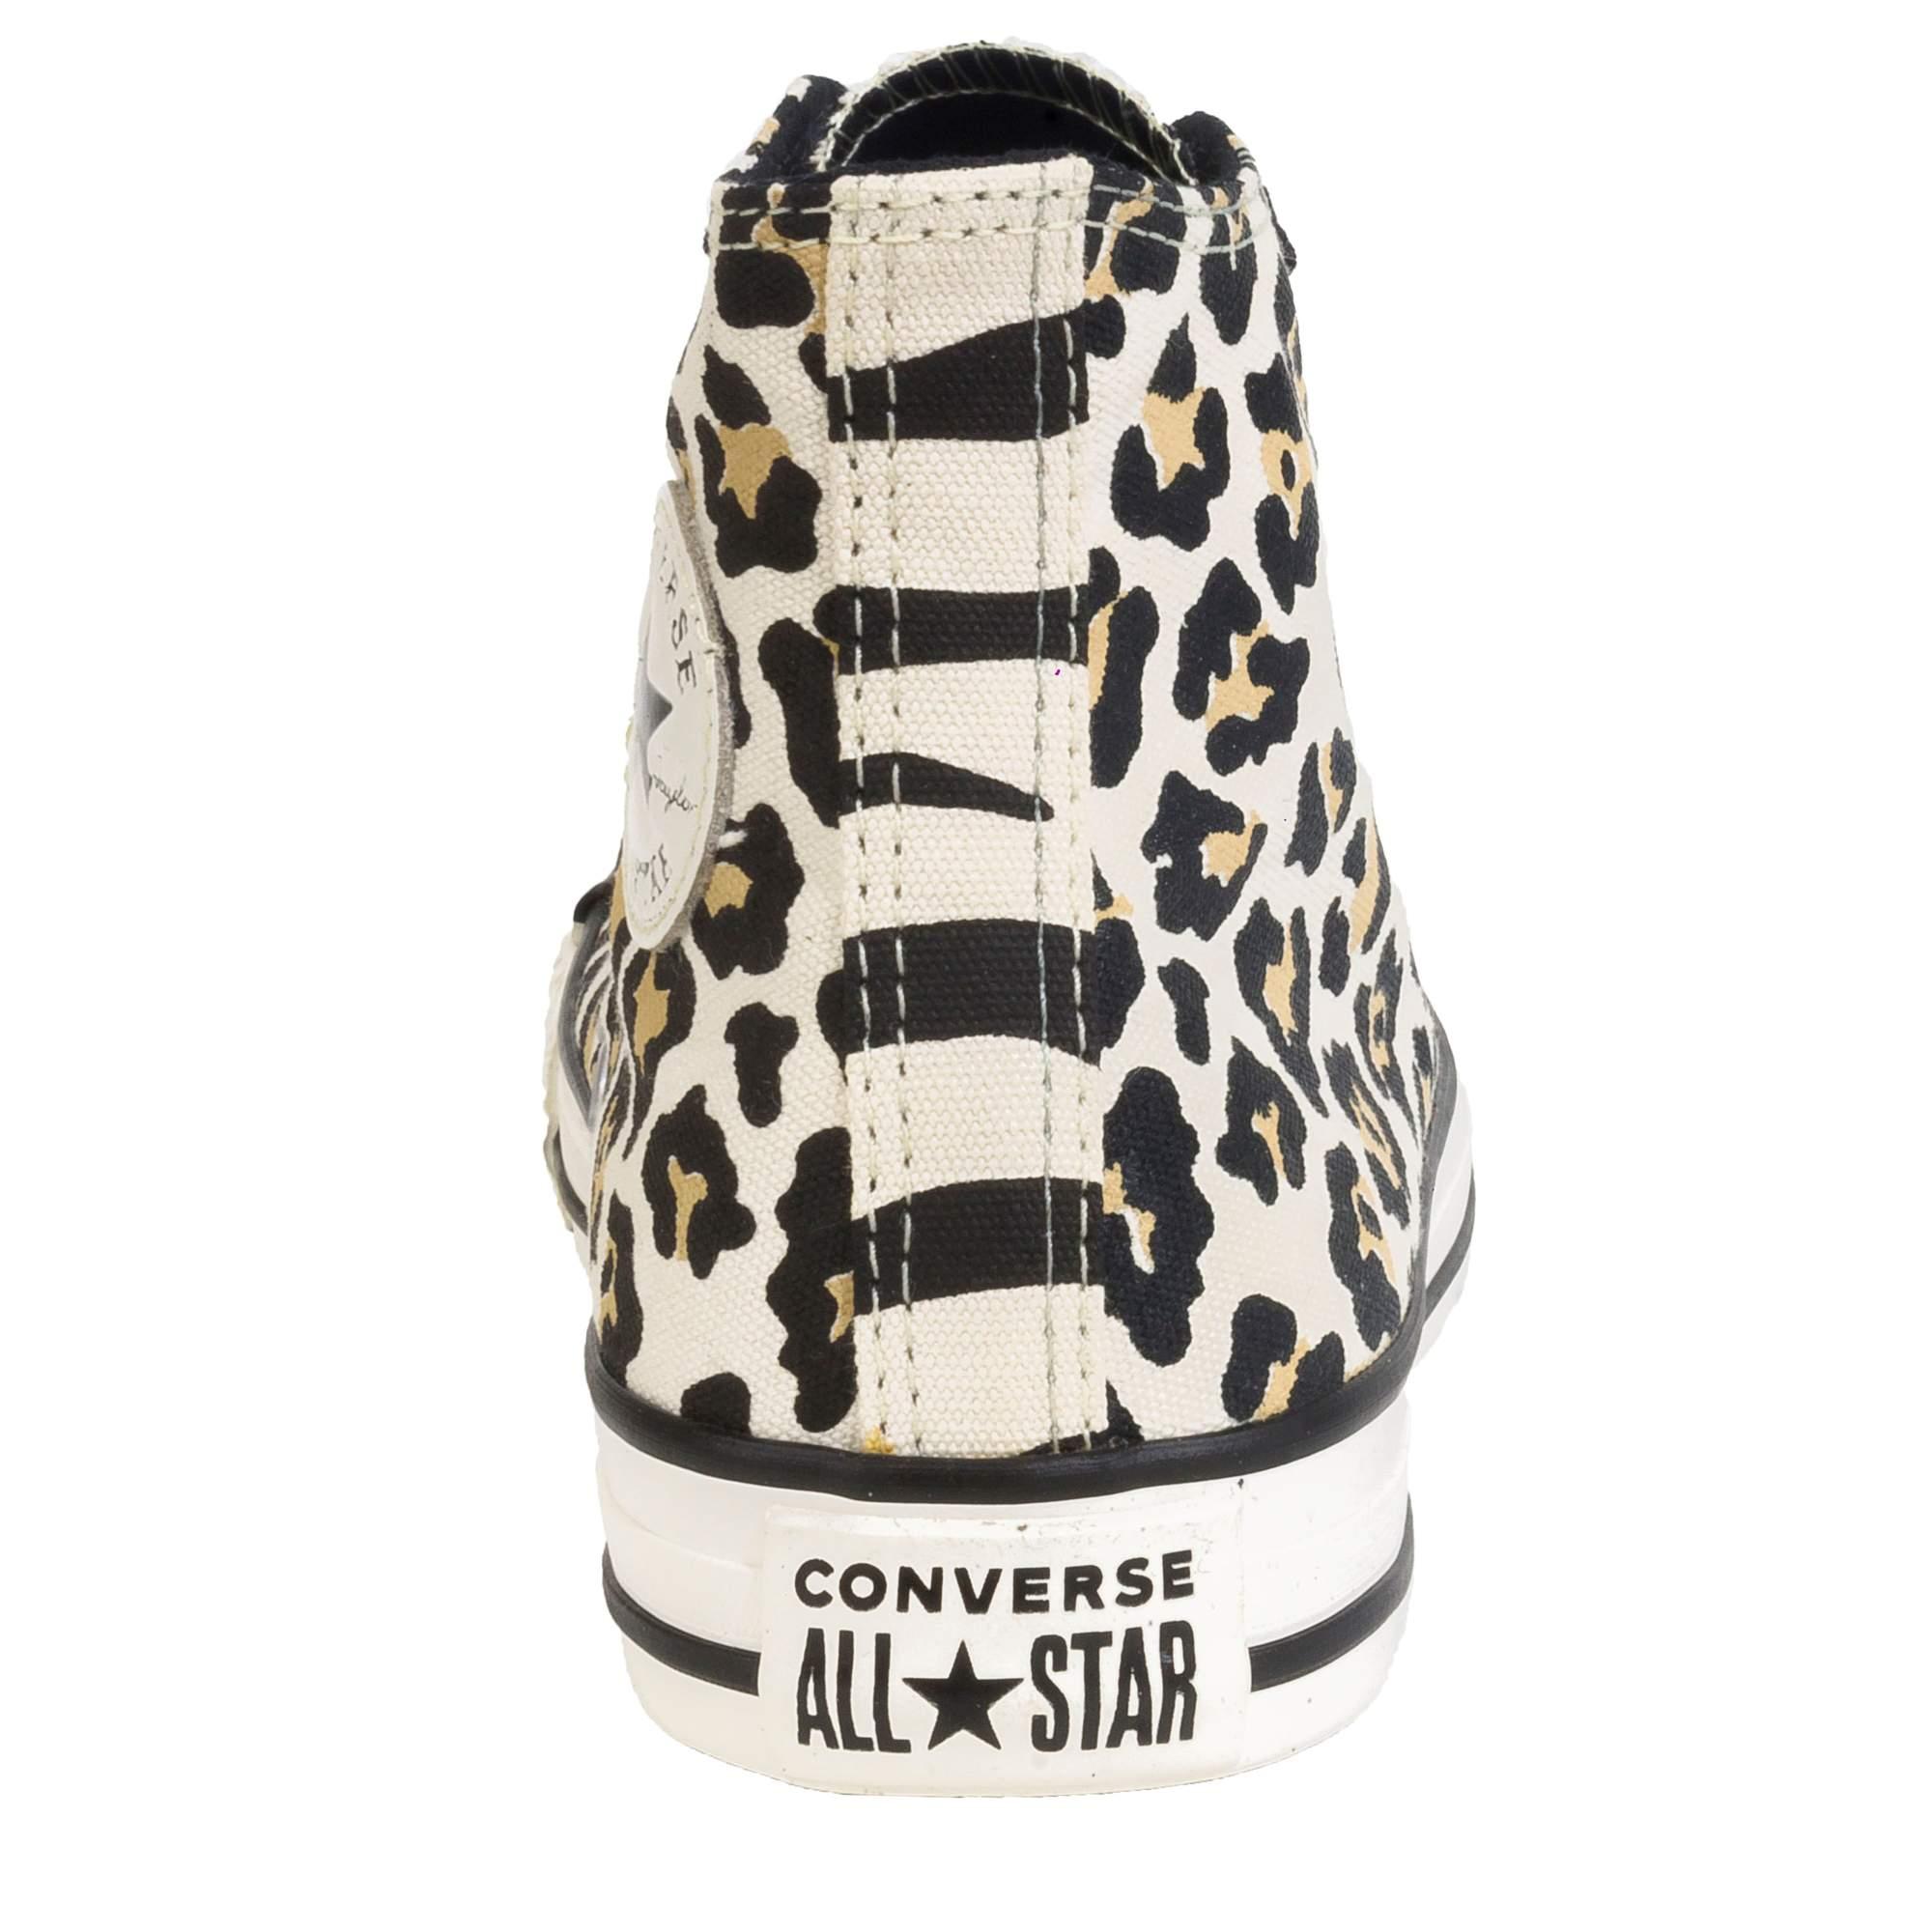 Bota Converse All Star Chuck Taylor Onça-Zebra